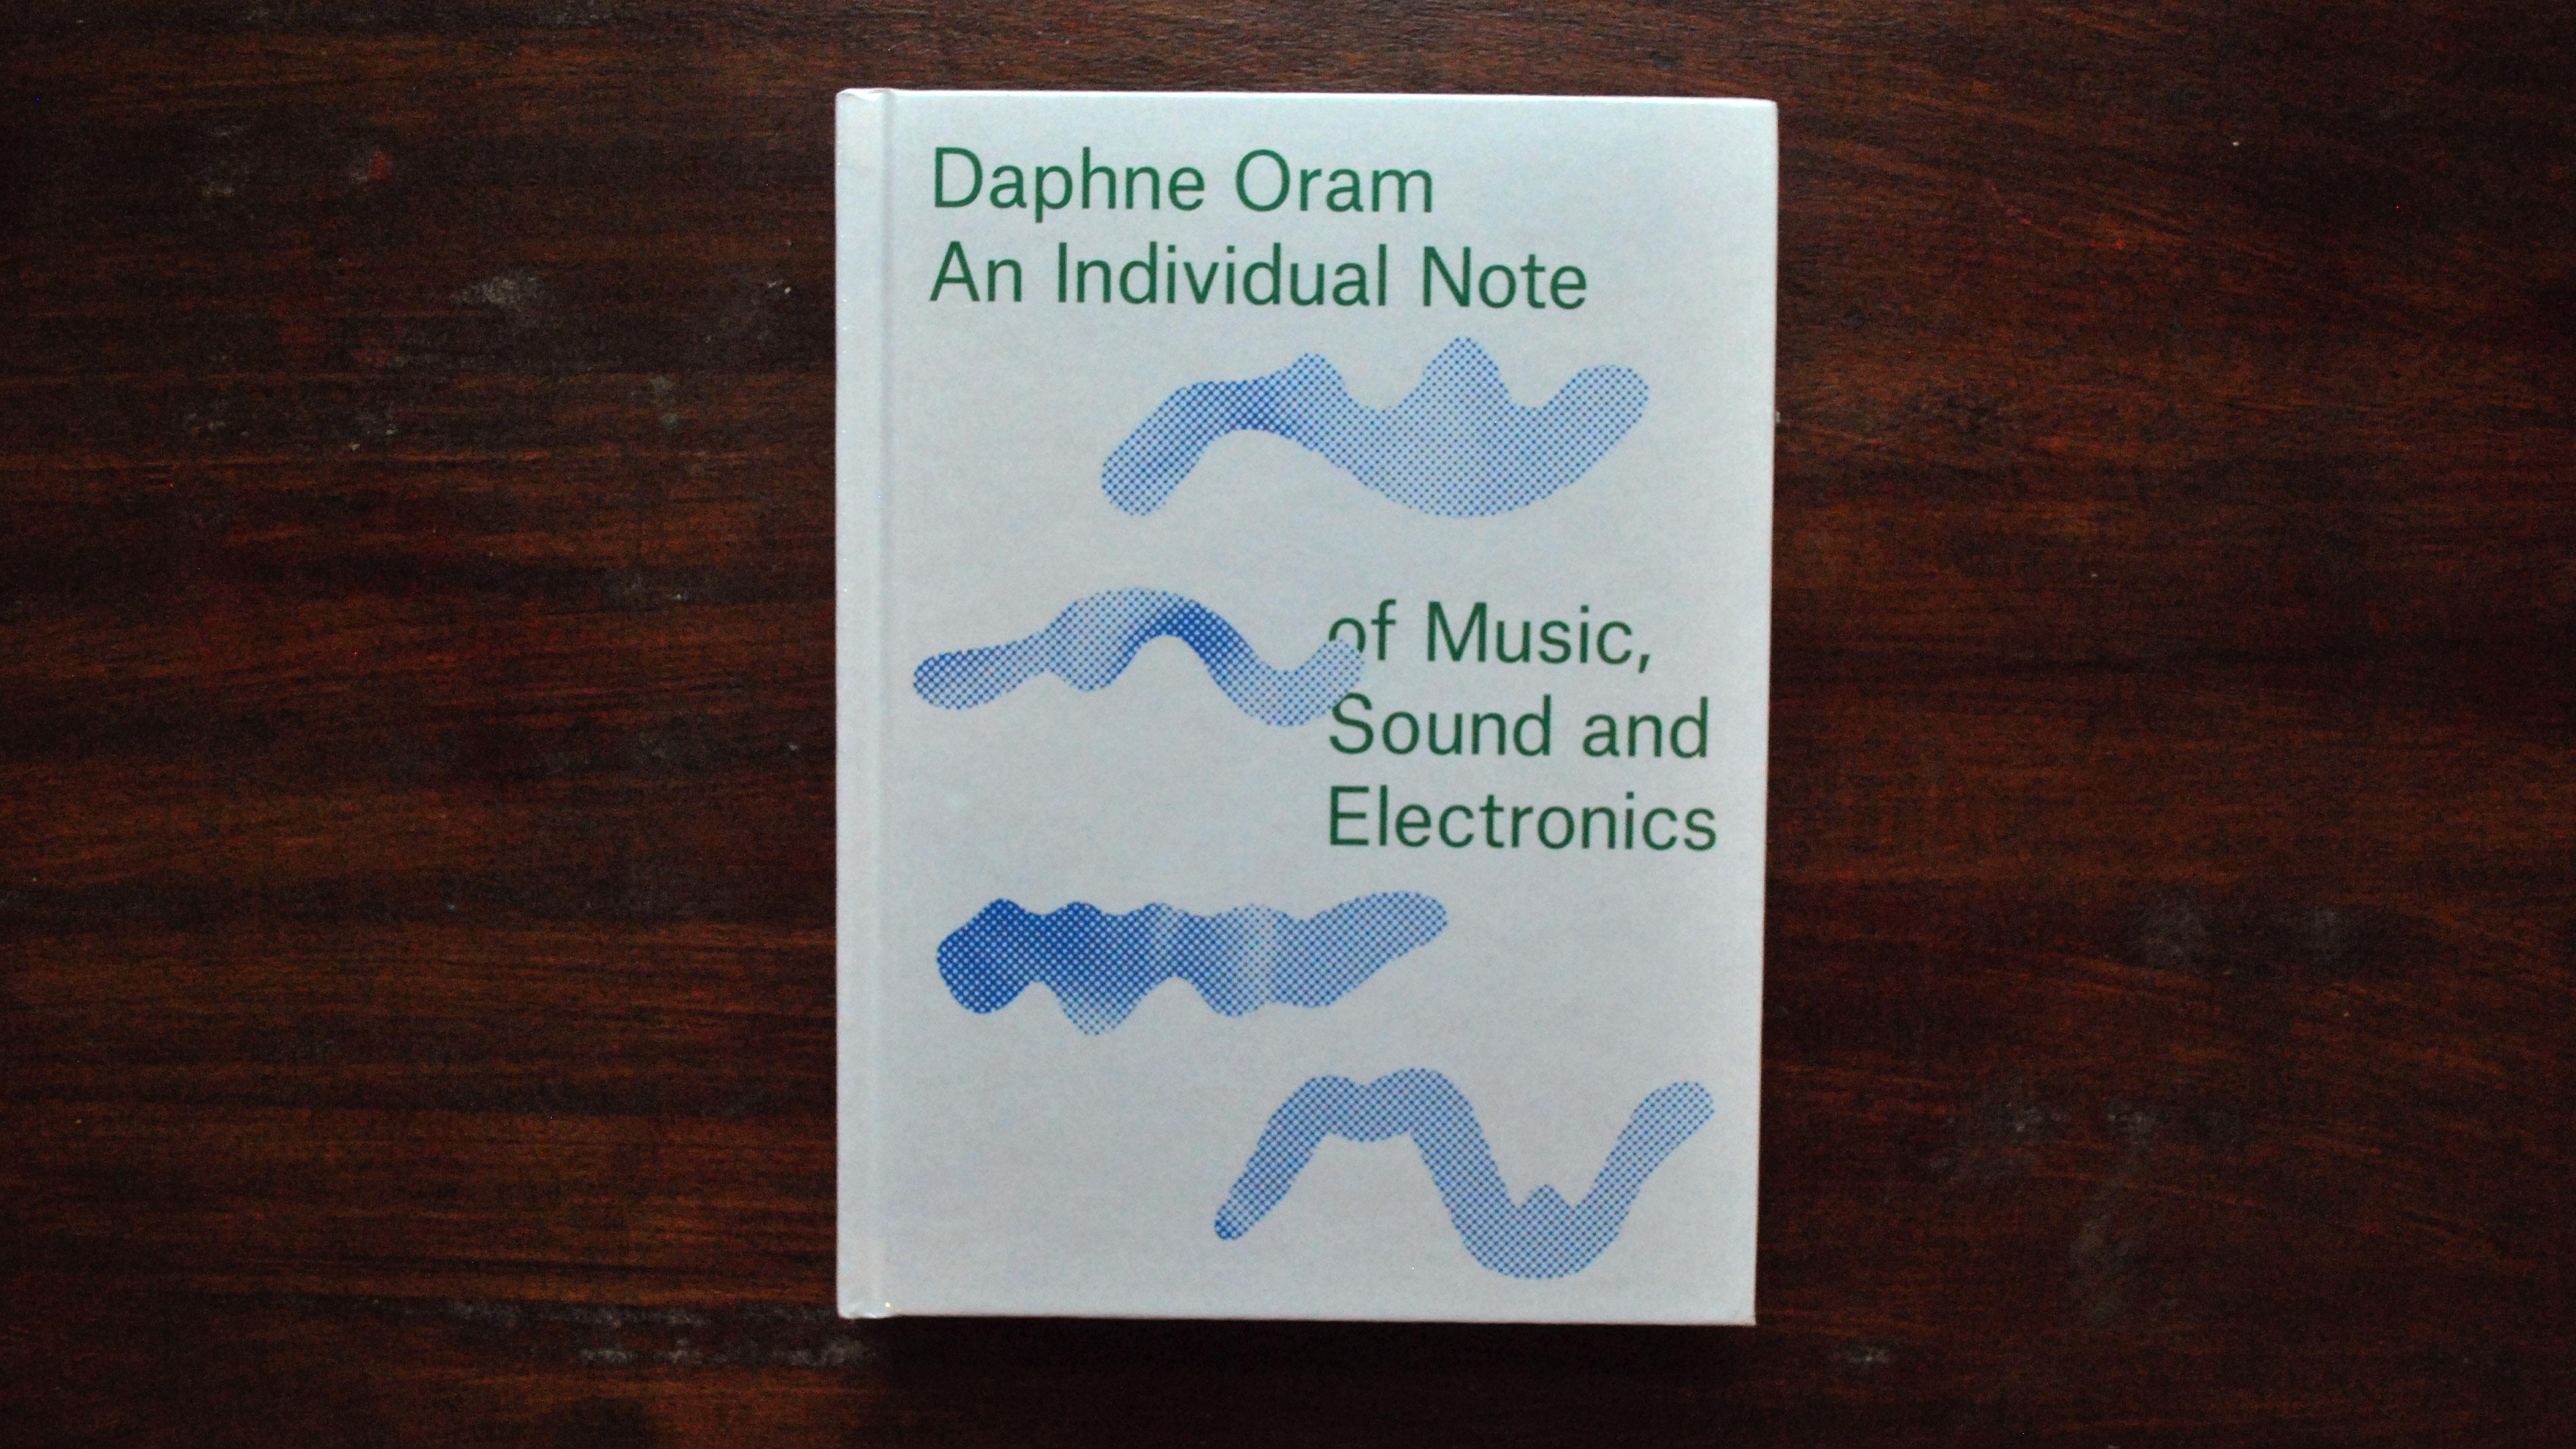 Daphne Oram - An Individual Note